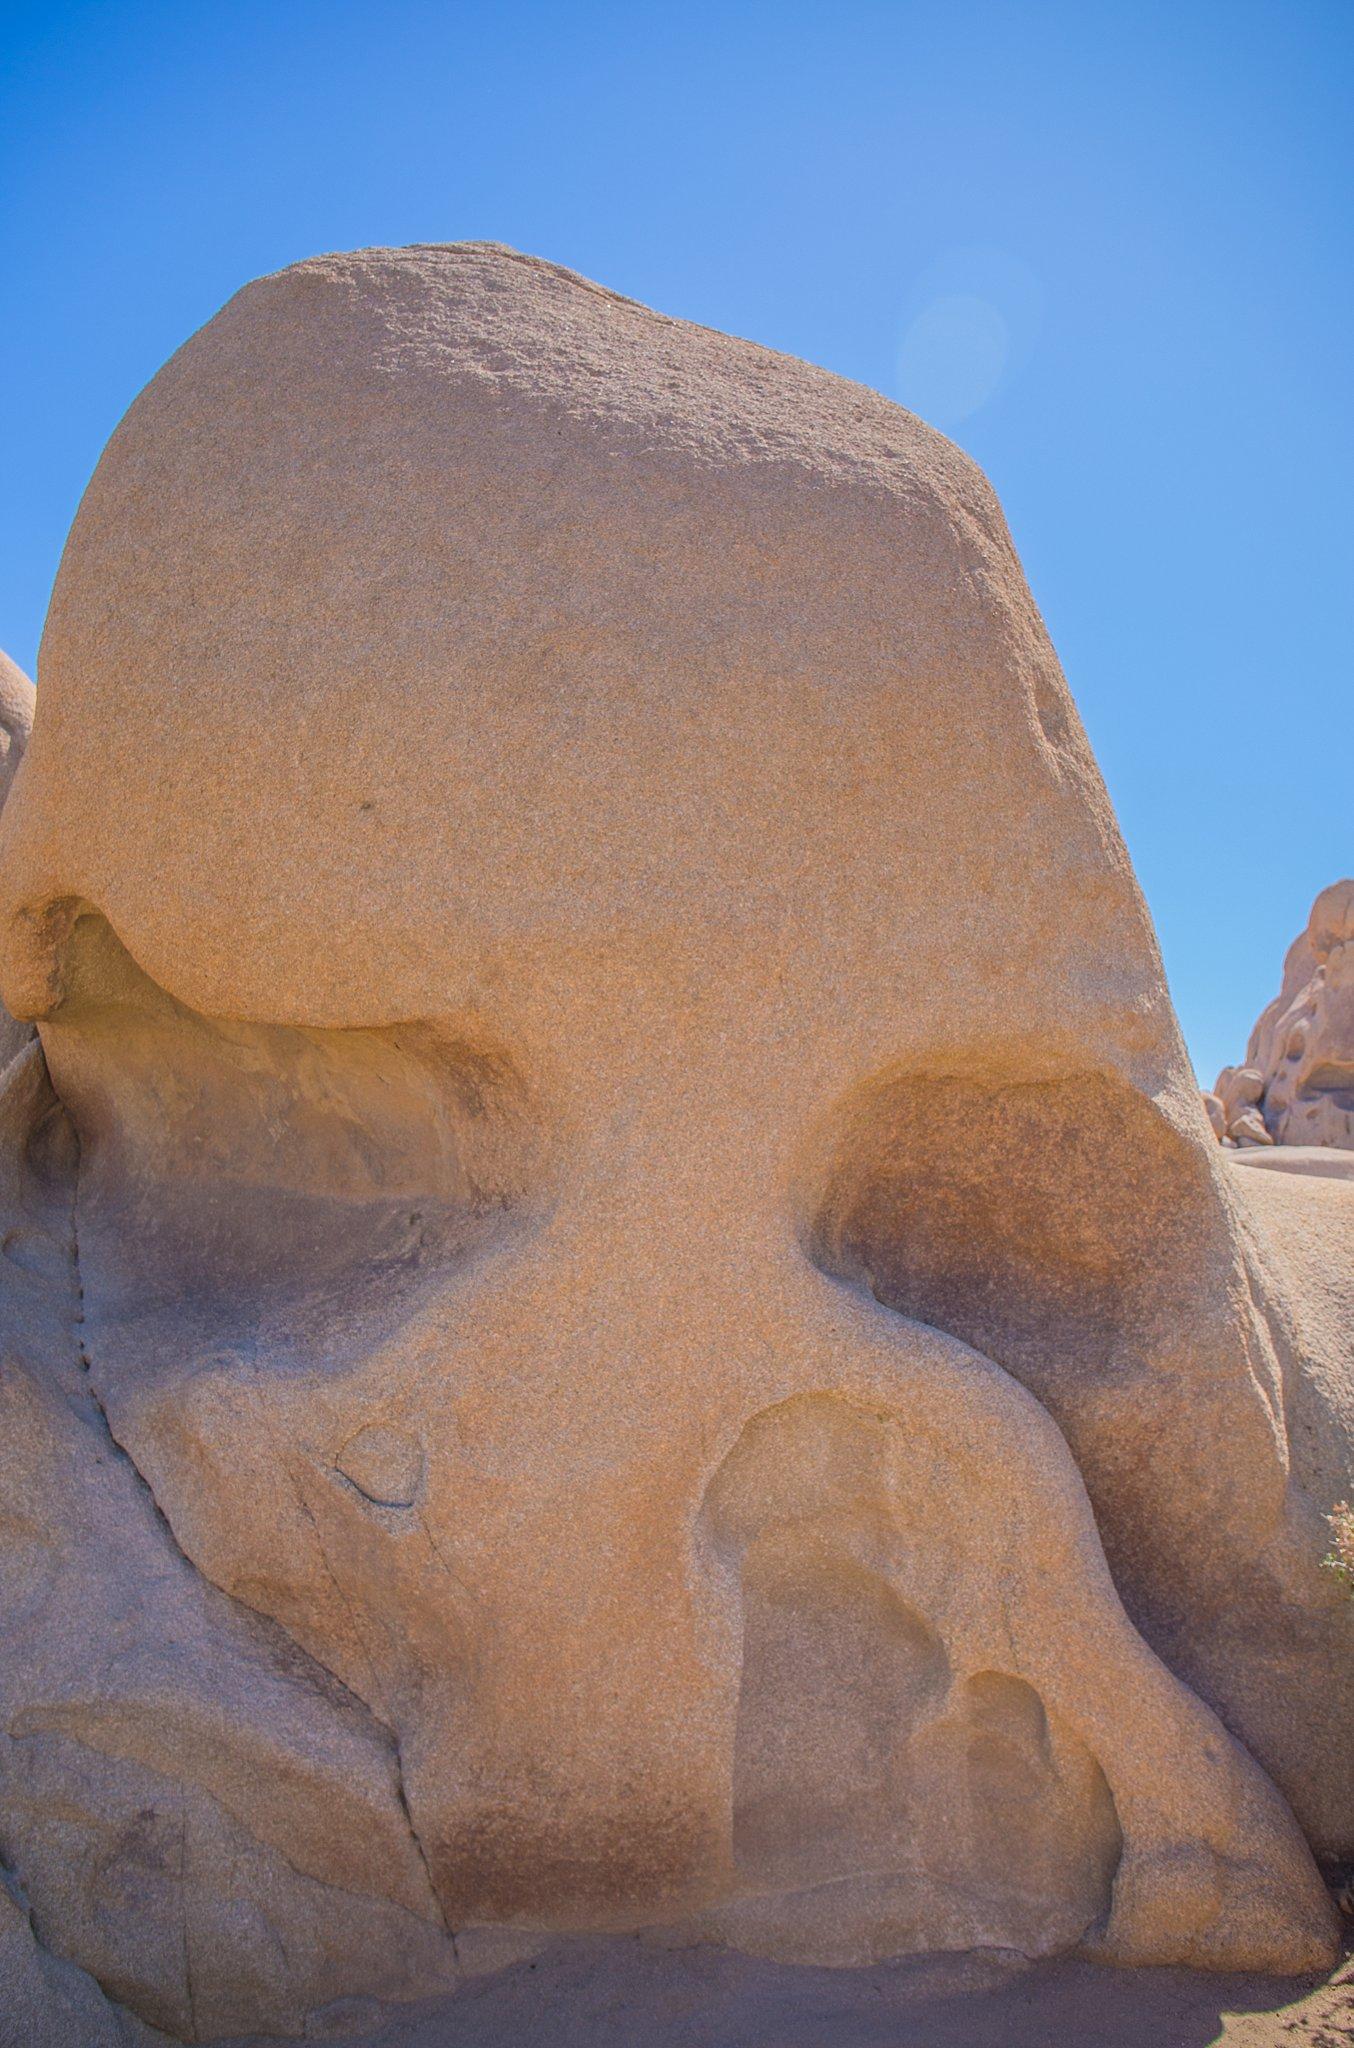 adventure,california,hilary gardiner photography,joshua tree national park,national park,next stop adventure,